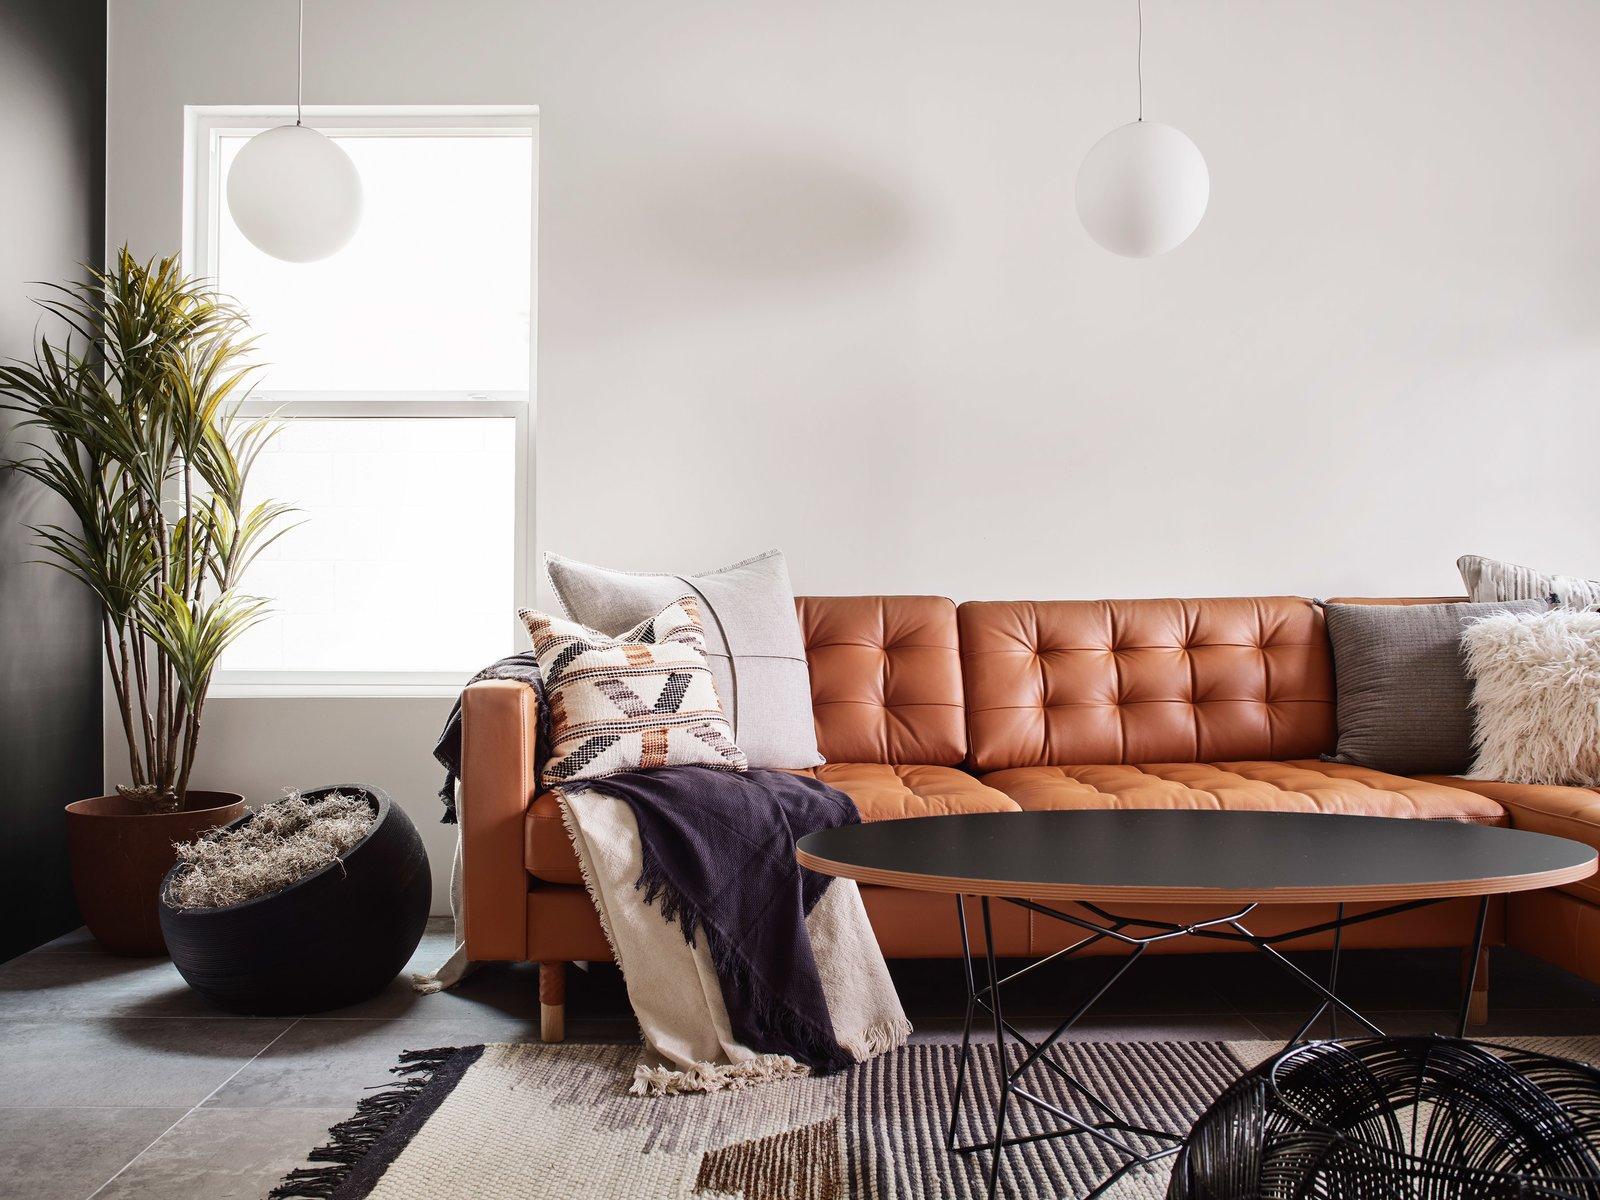 Living Room, Porcelain Tile Floor, Pendant Lighting, and Sectional Living room w/ pendant lights above the seating area  Details